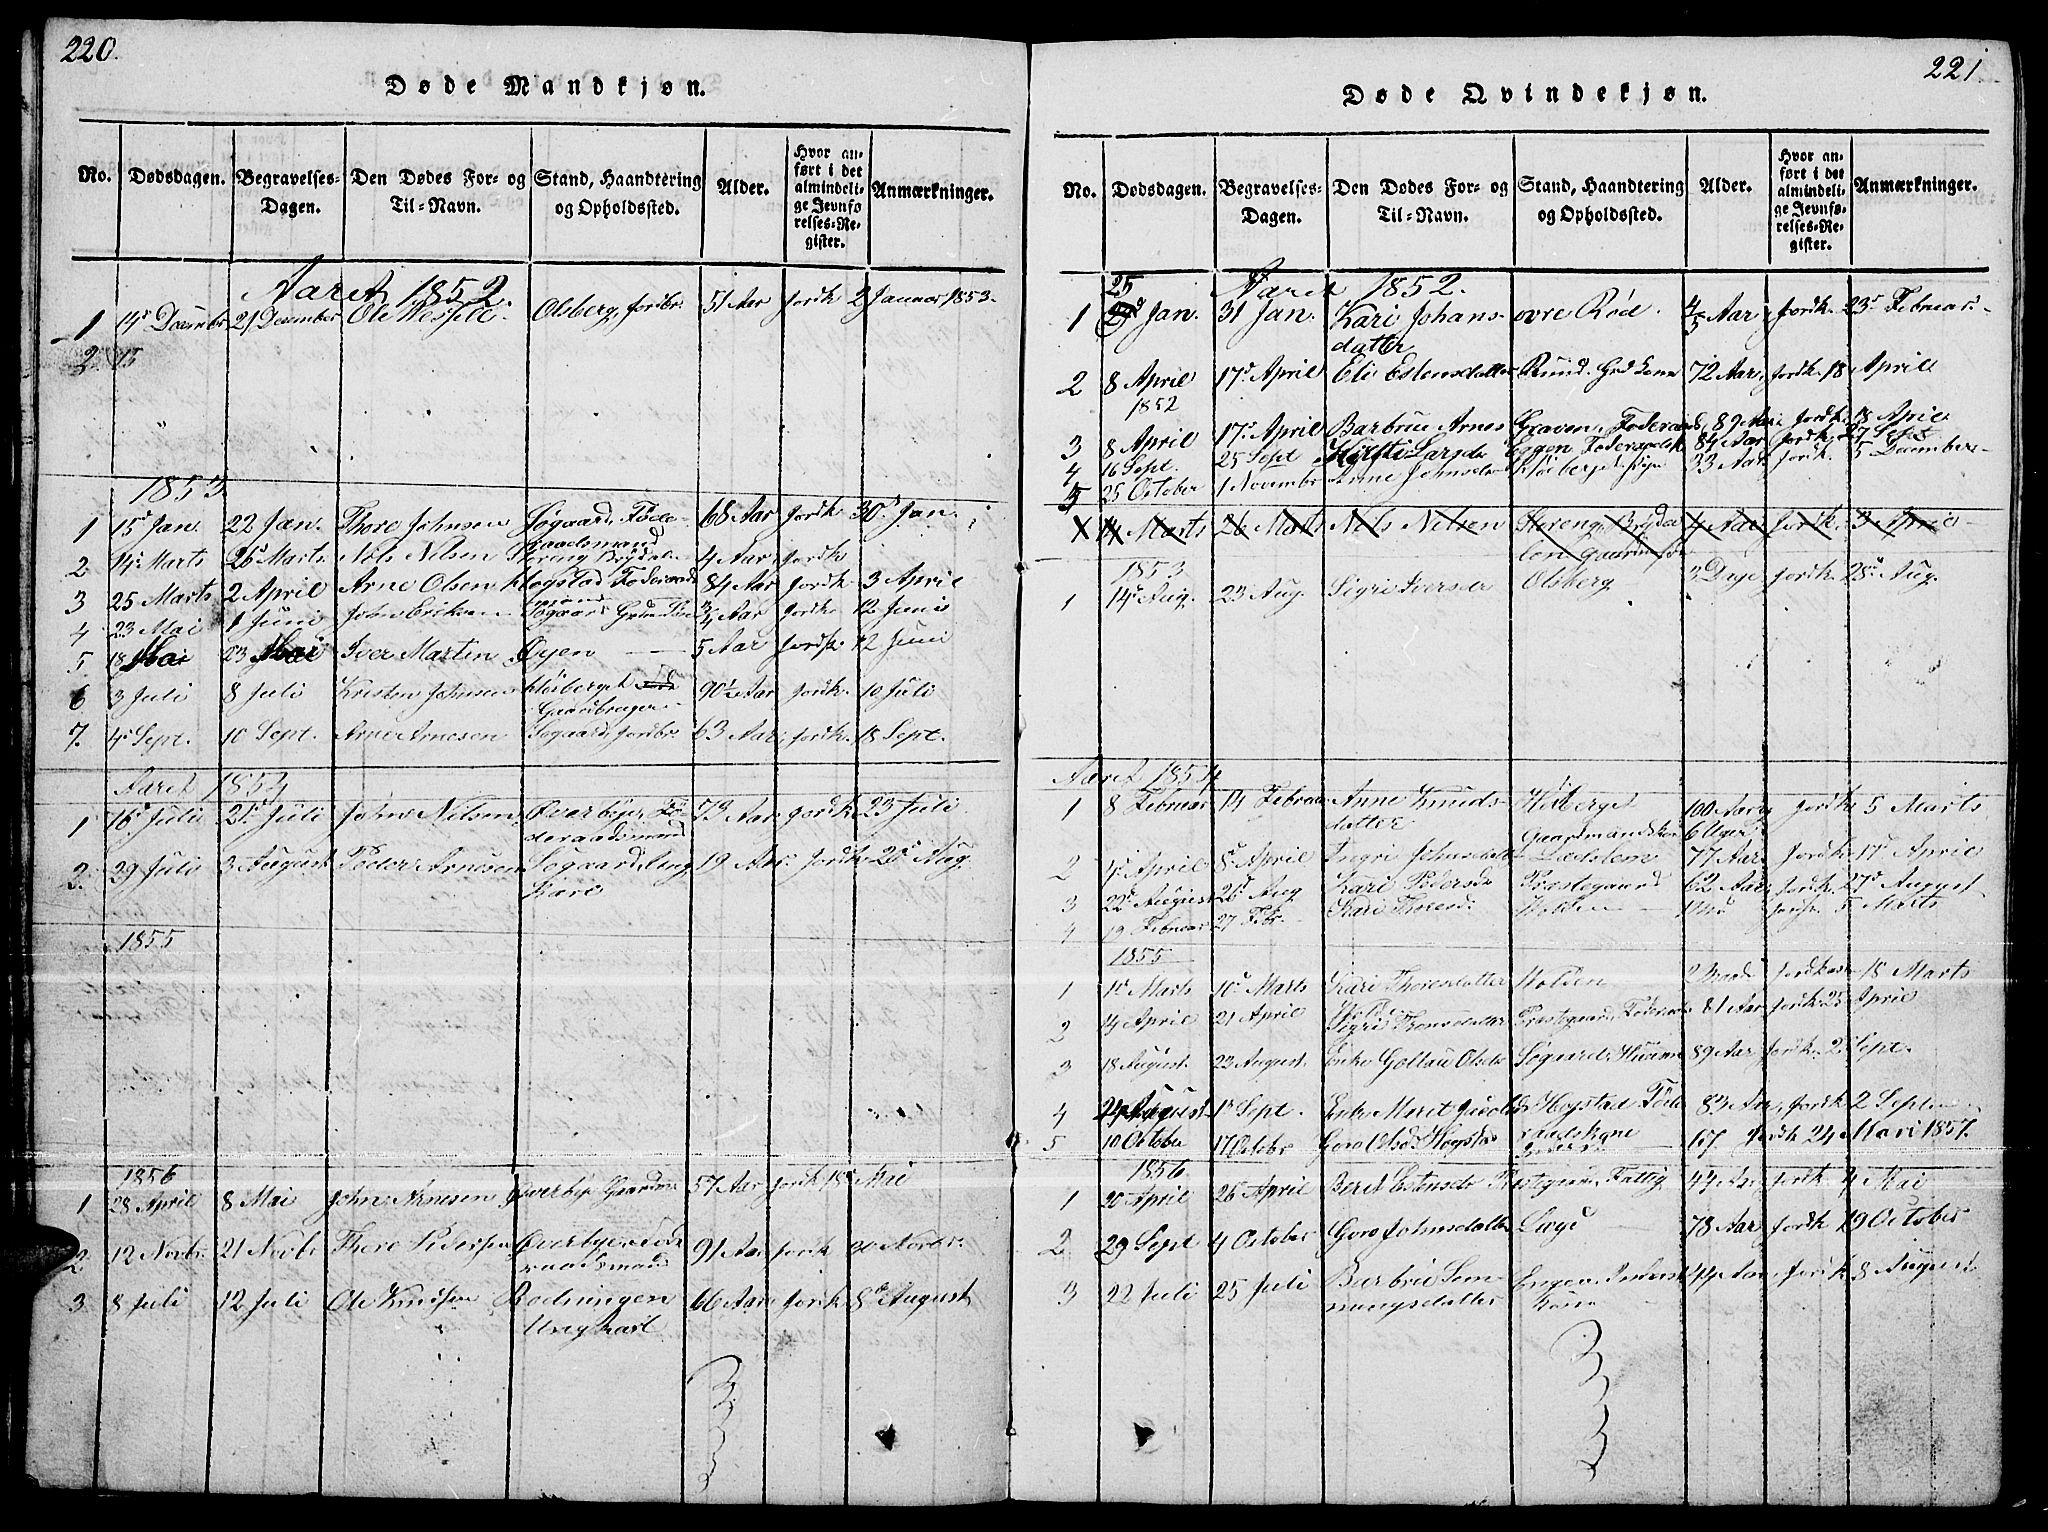 SAH, Tynset prestekontor, Klokkerbok nr. 4, 1814-1879, s. 220-221